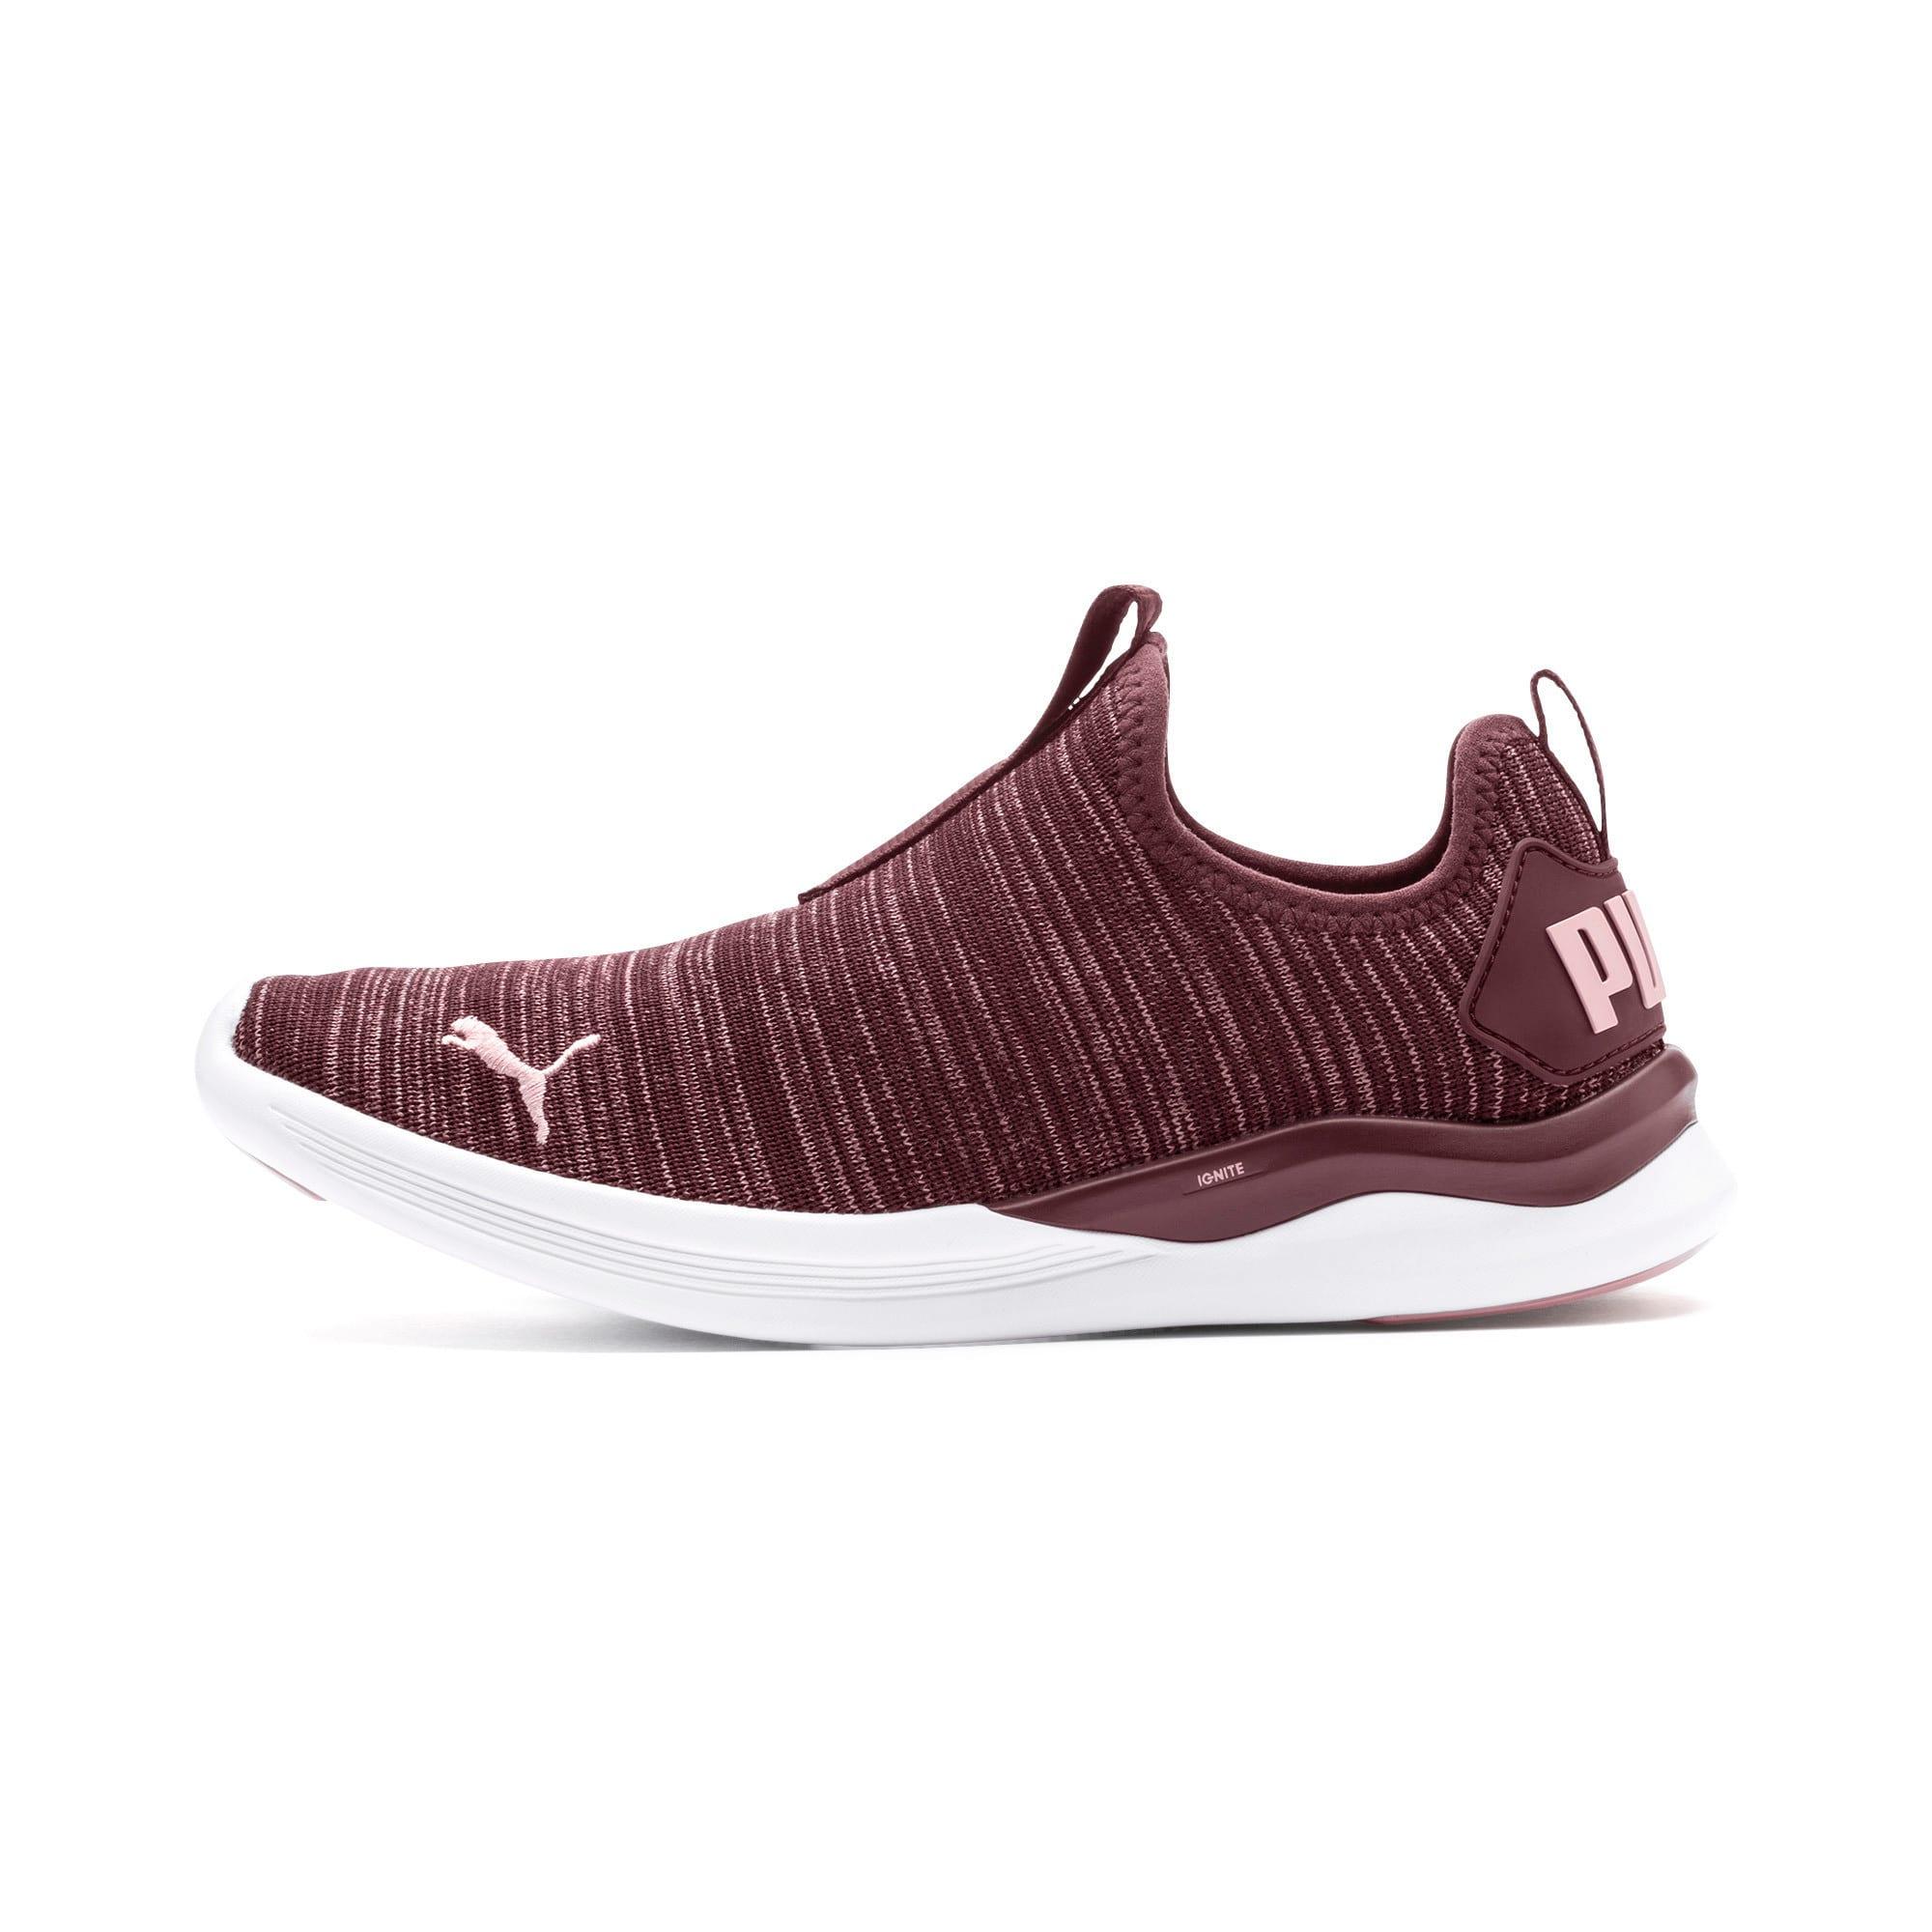 Thumbnail 1 of IGNITE Flash Summer Slip Women's Training Shoes, Vineyard Wine-Bridal Rose, medium